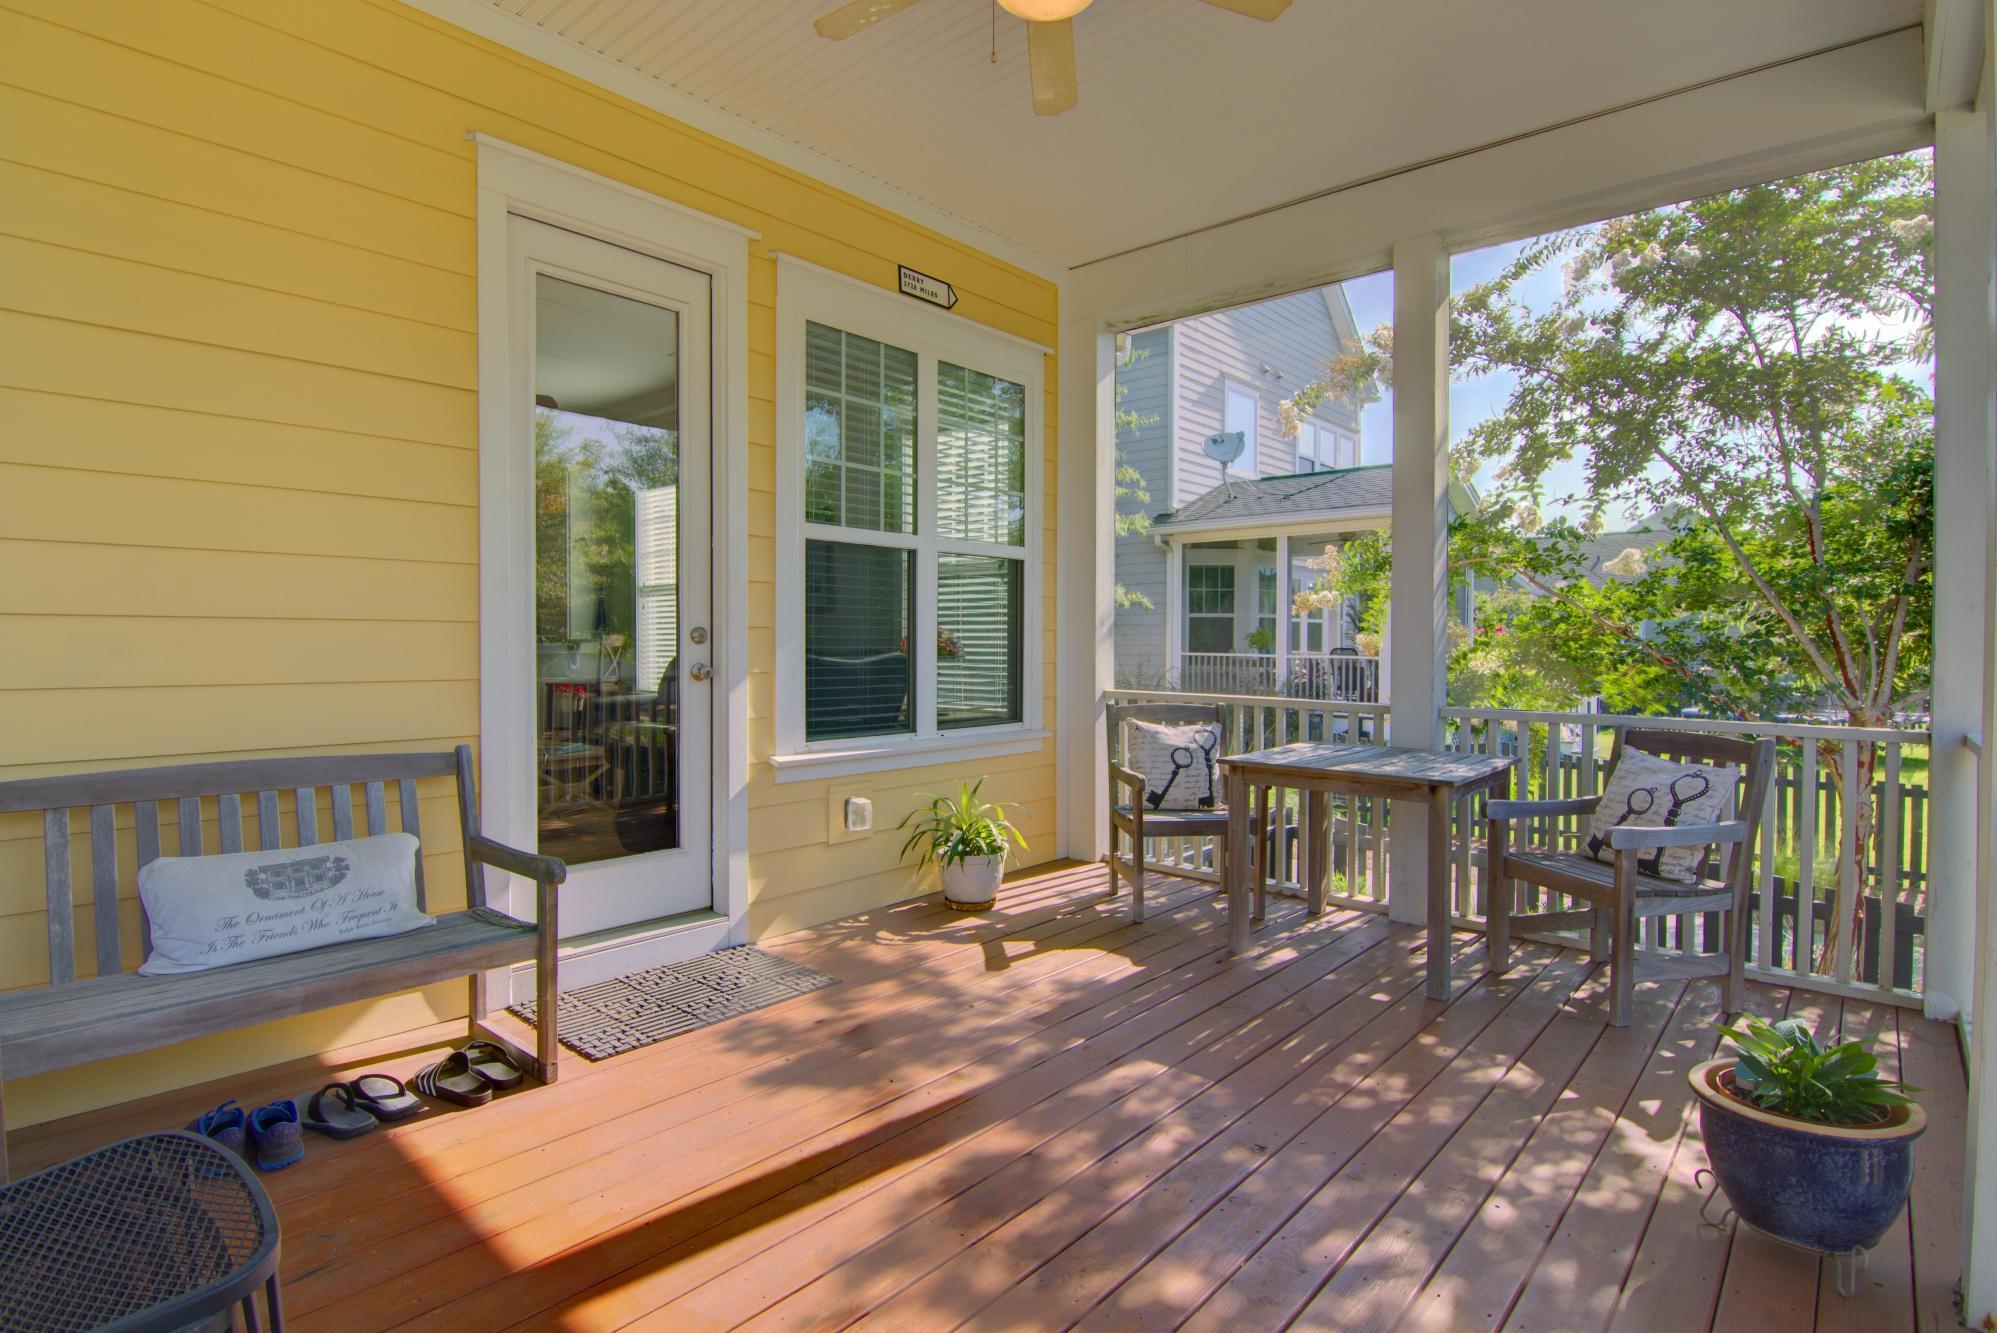 Daniel Island Smythe Park Homes For Sale - 1515 Mitchell Wharf, Daniel Island, SC - 17